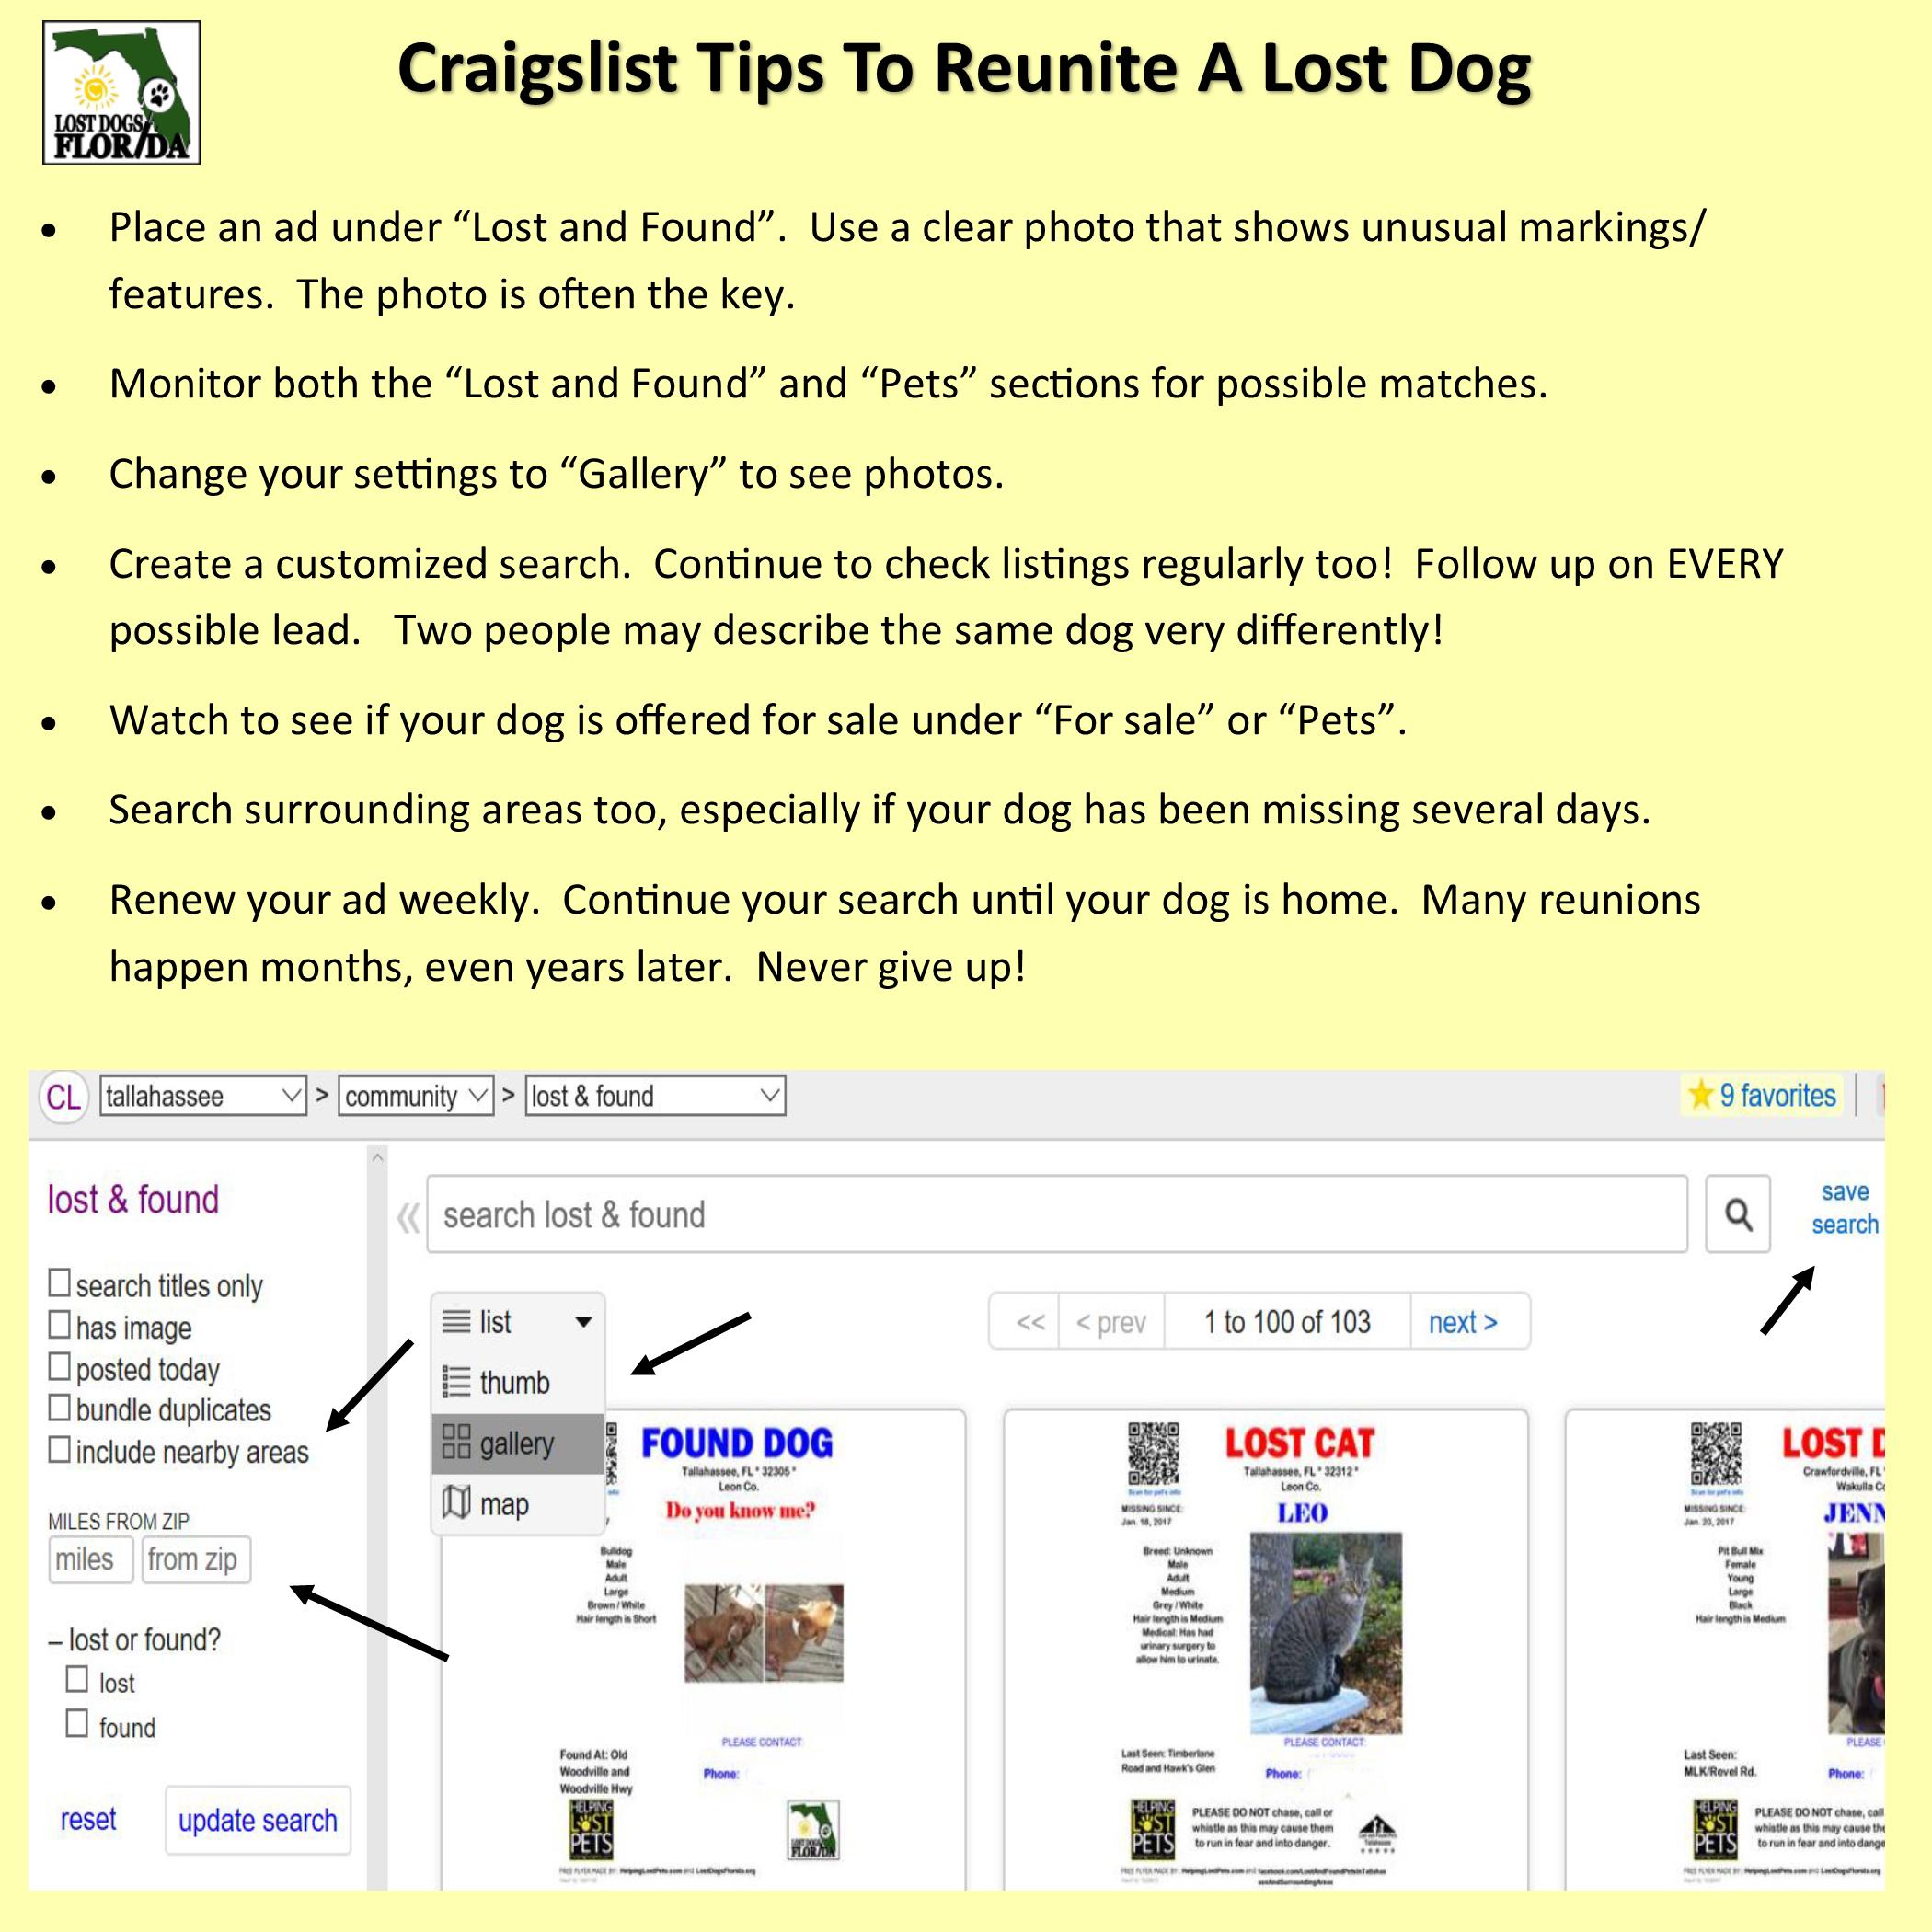 Craigslist tips to reunite a lost dog | Losing a dog ...